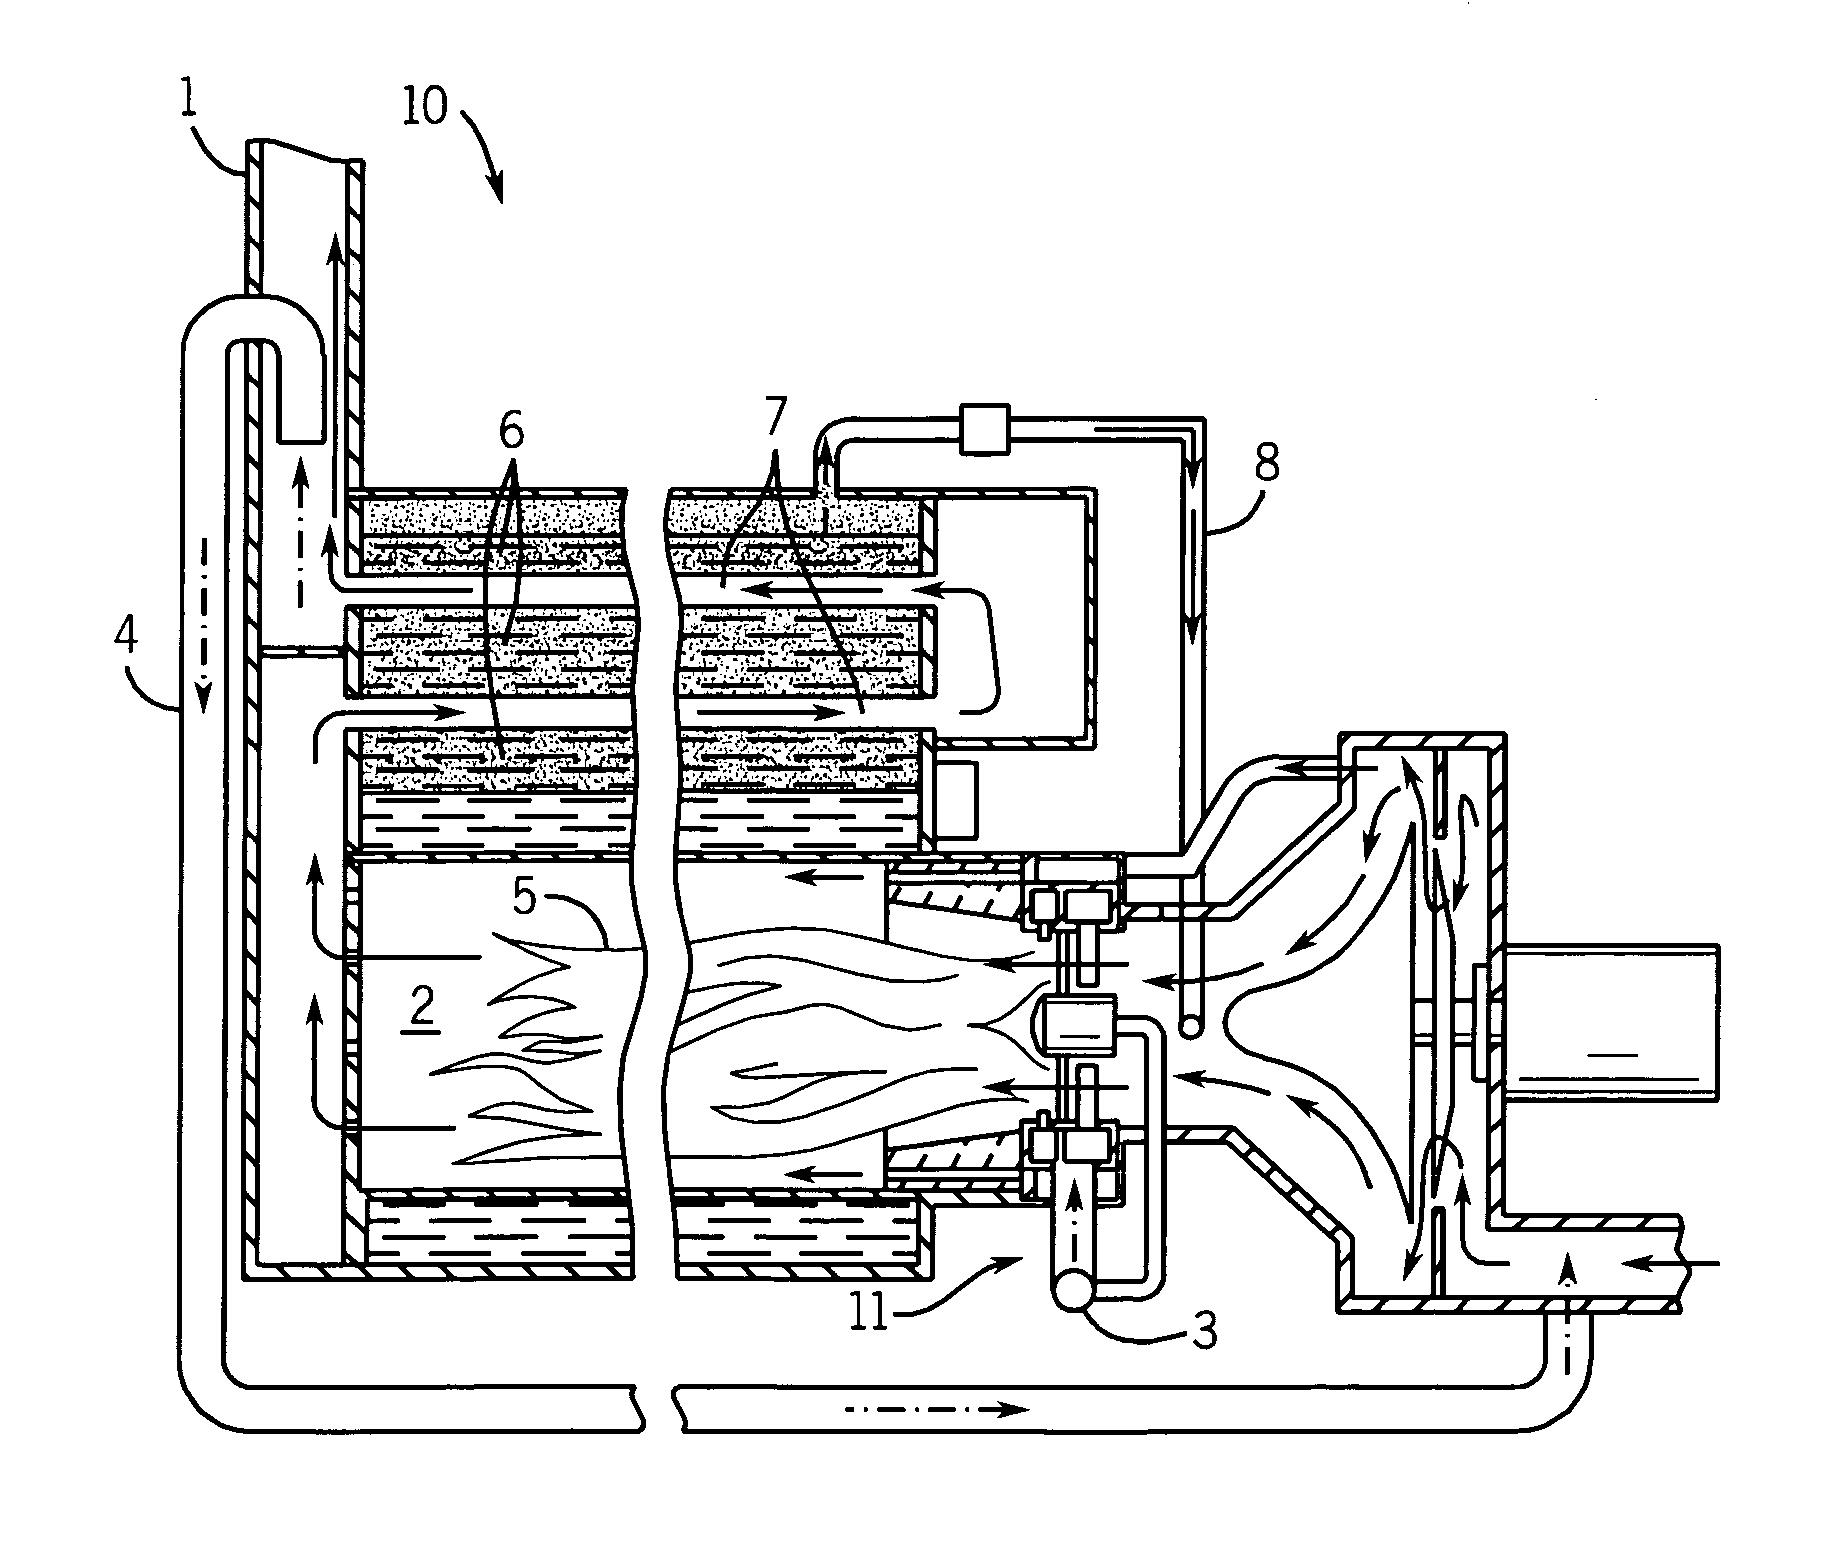 Mark 8 Boiler Controls Autoflame Wiring Diagram Youtube